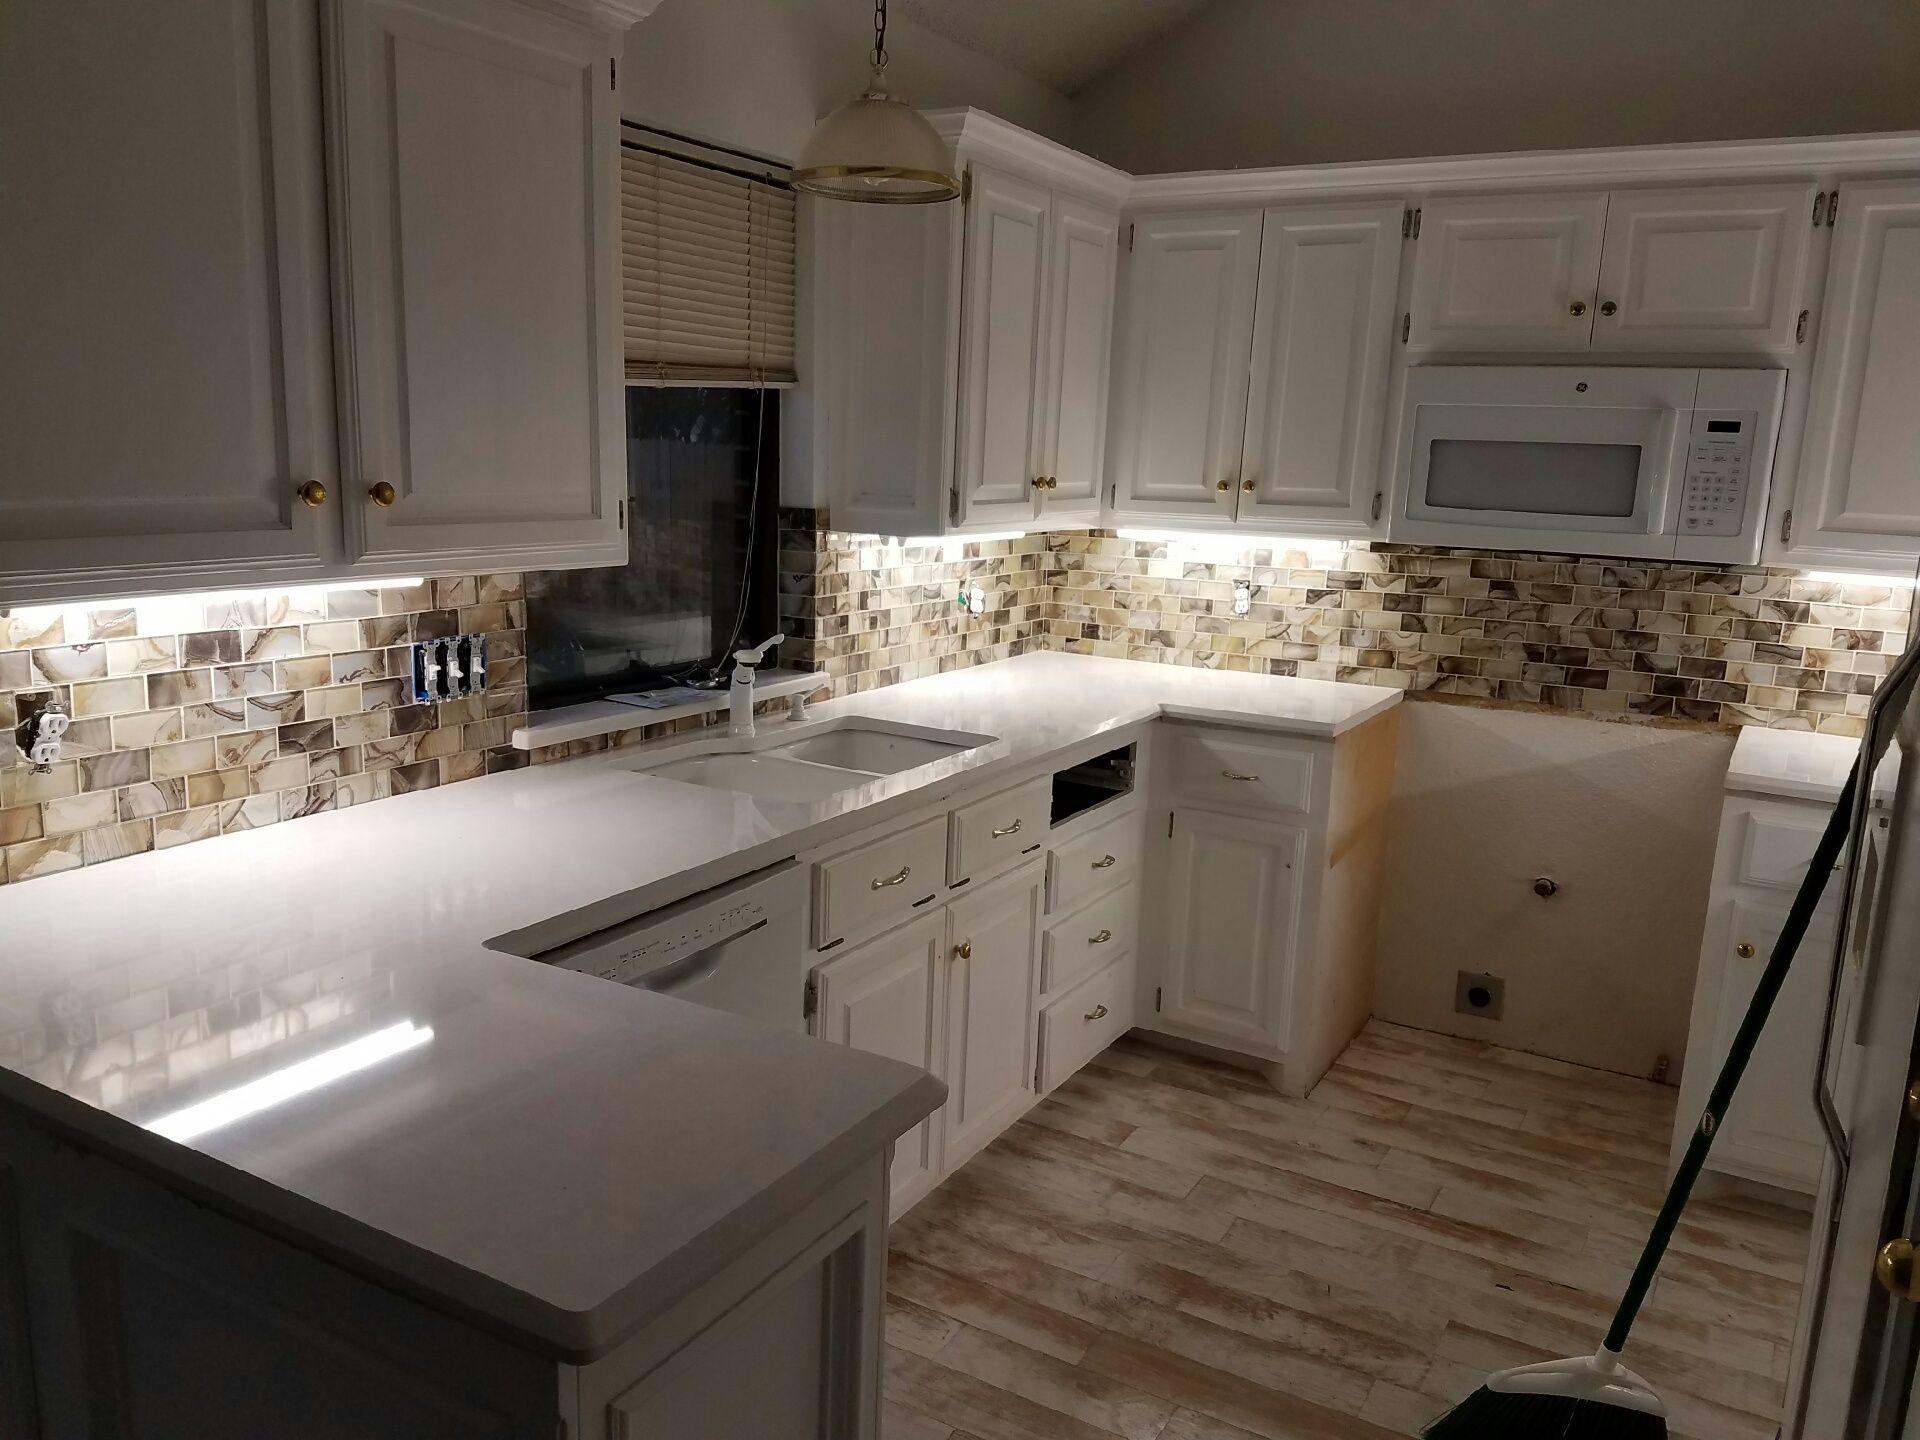 Quartz Countertop And Tile Backsplash By T T T T Custom Countertops